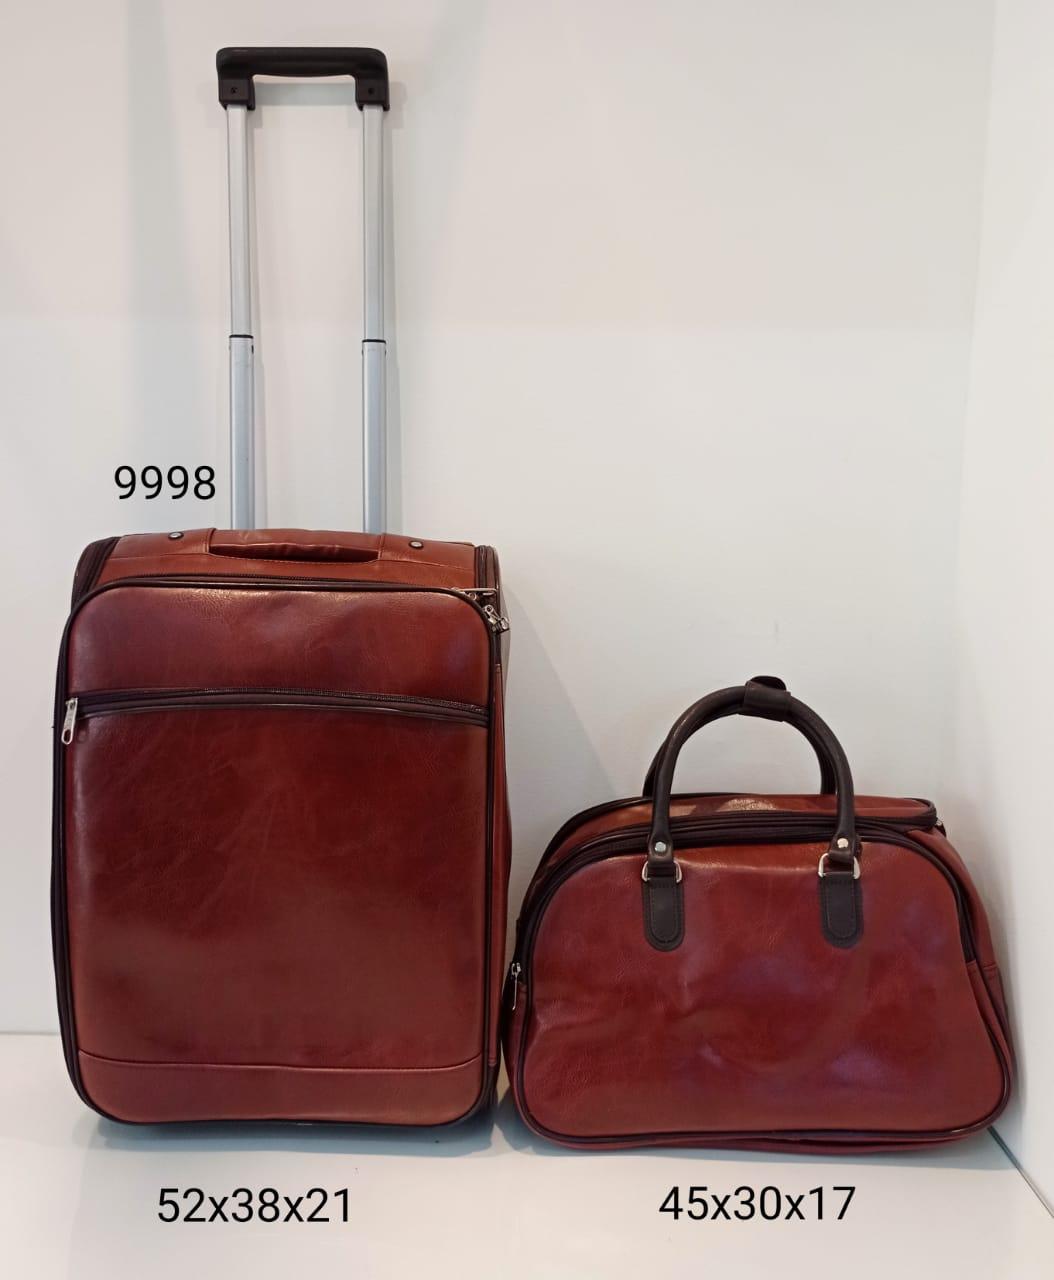 999-8 Kit Mala de Viagem Royal Style Couro PU